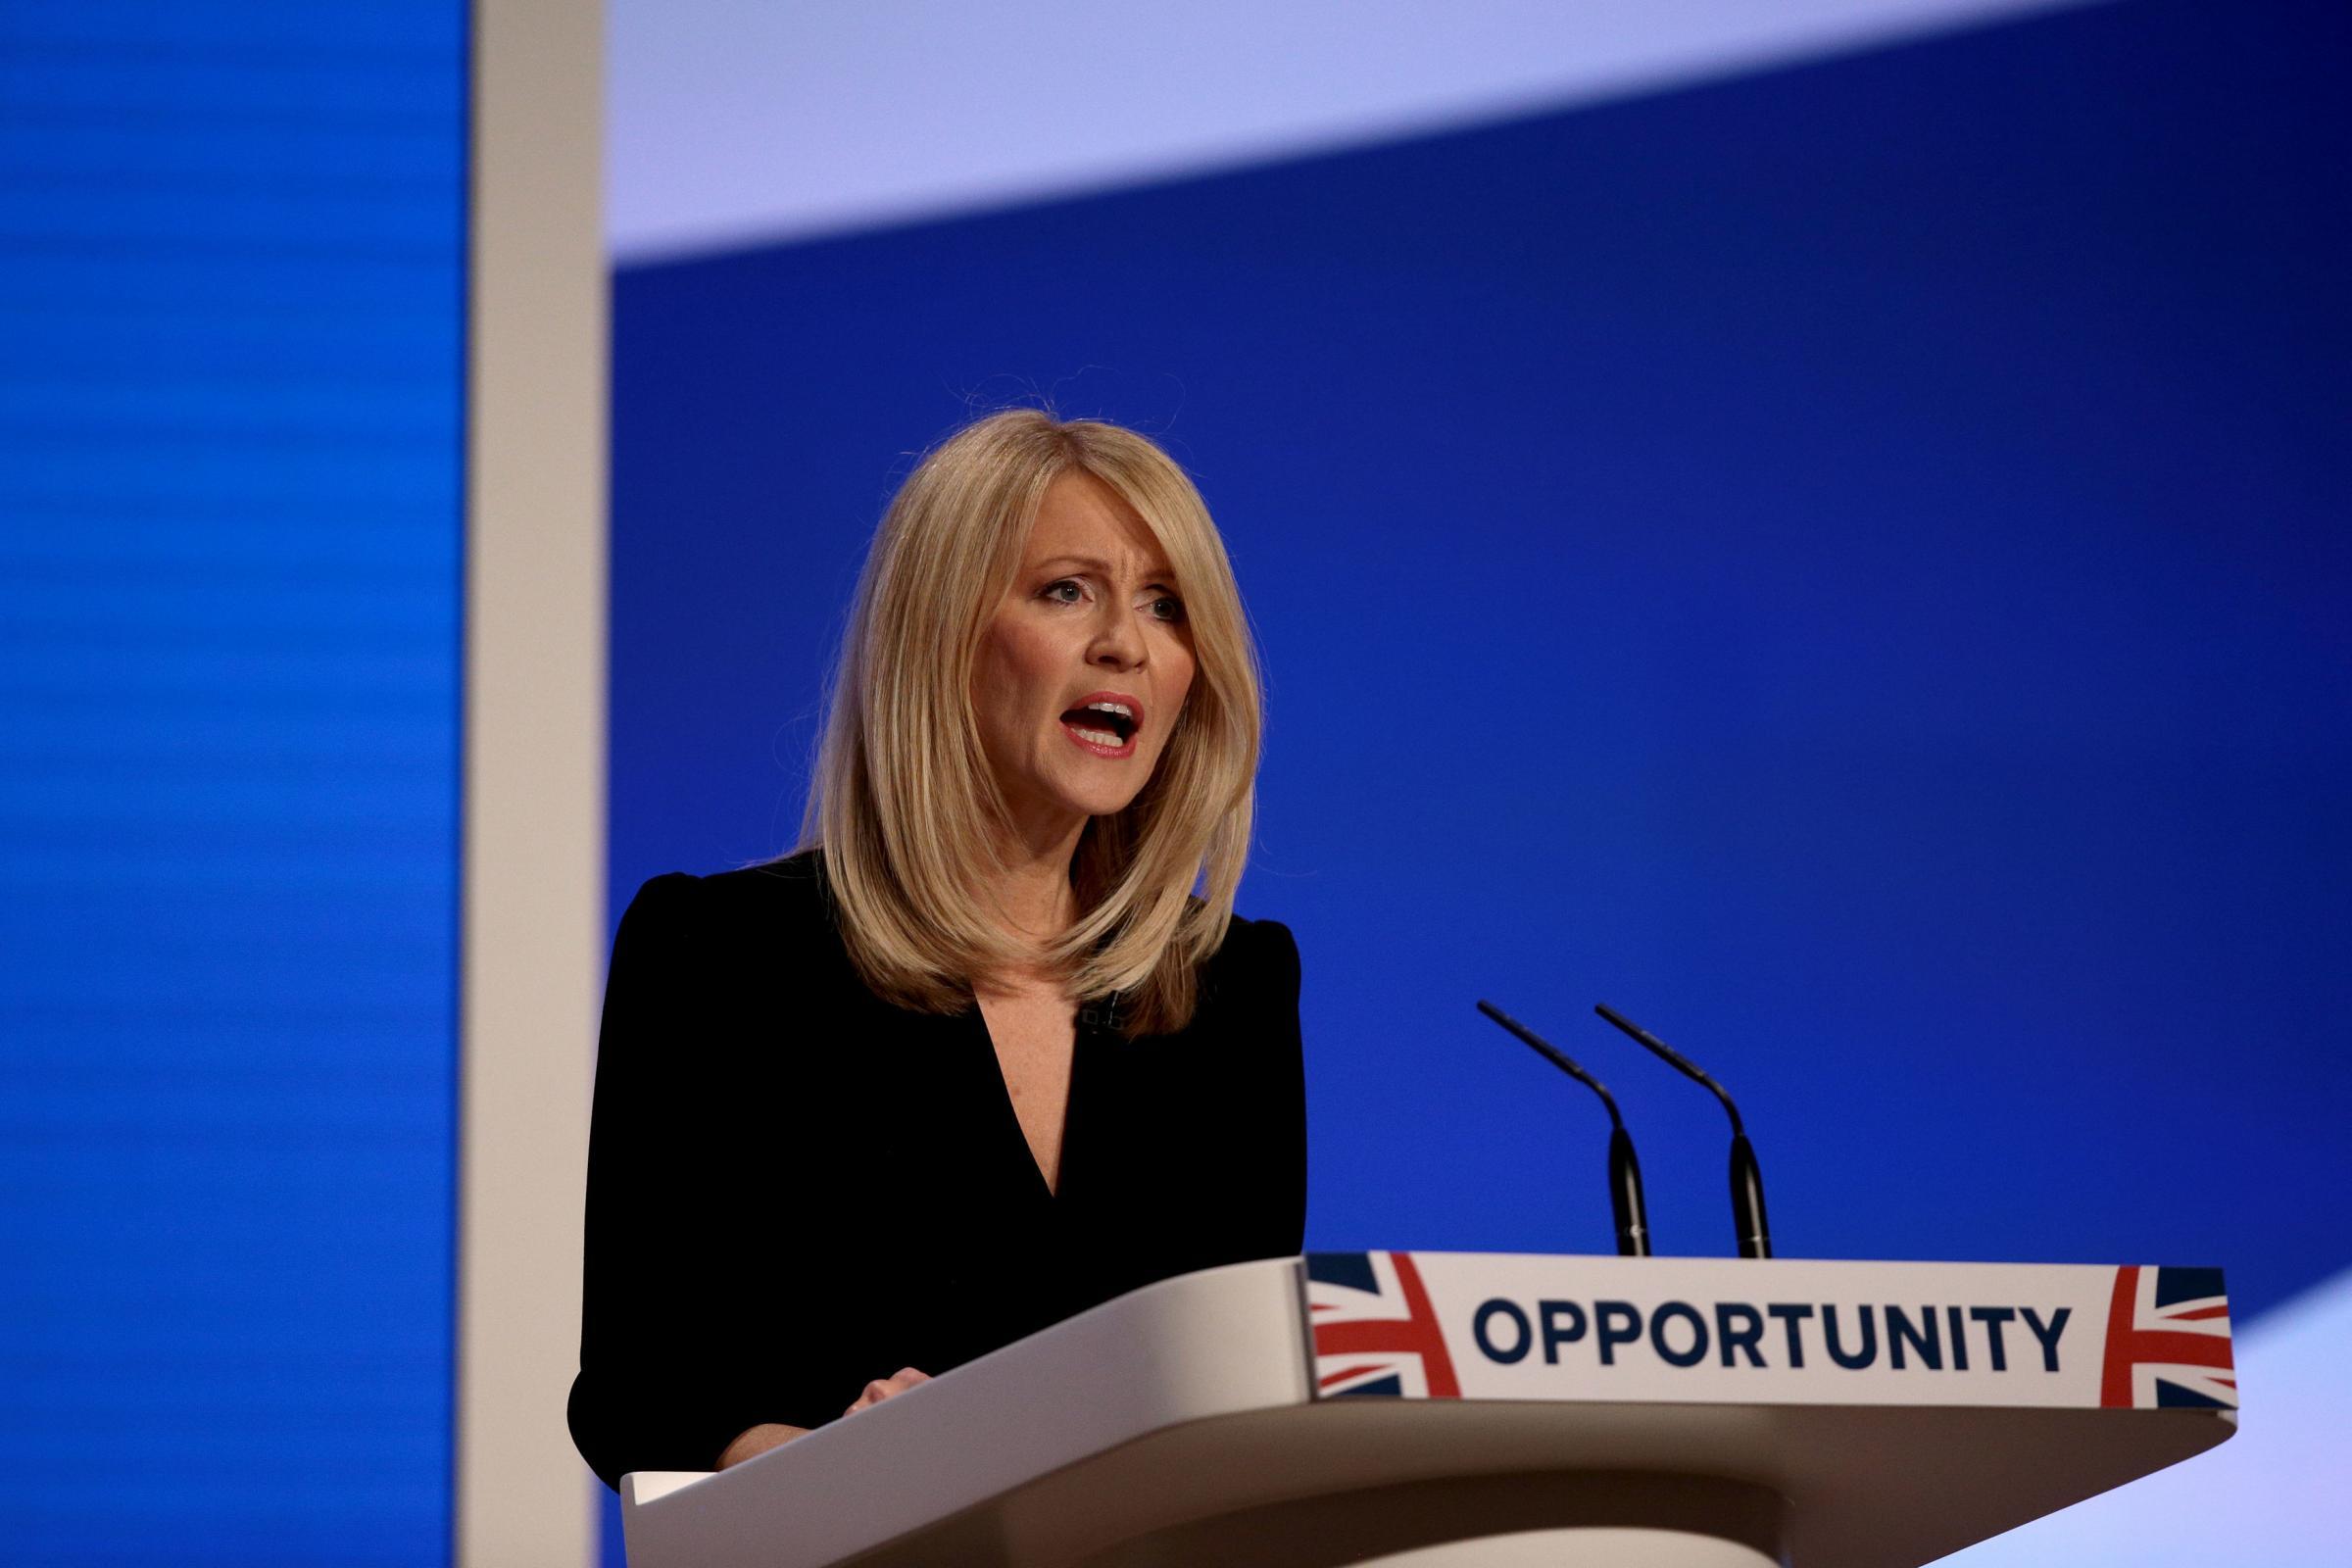 Mhairi Black: Tories know Universal Credit causes harm despite their speeches